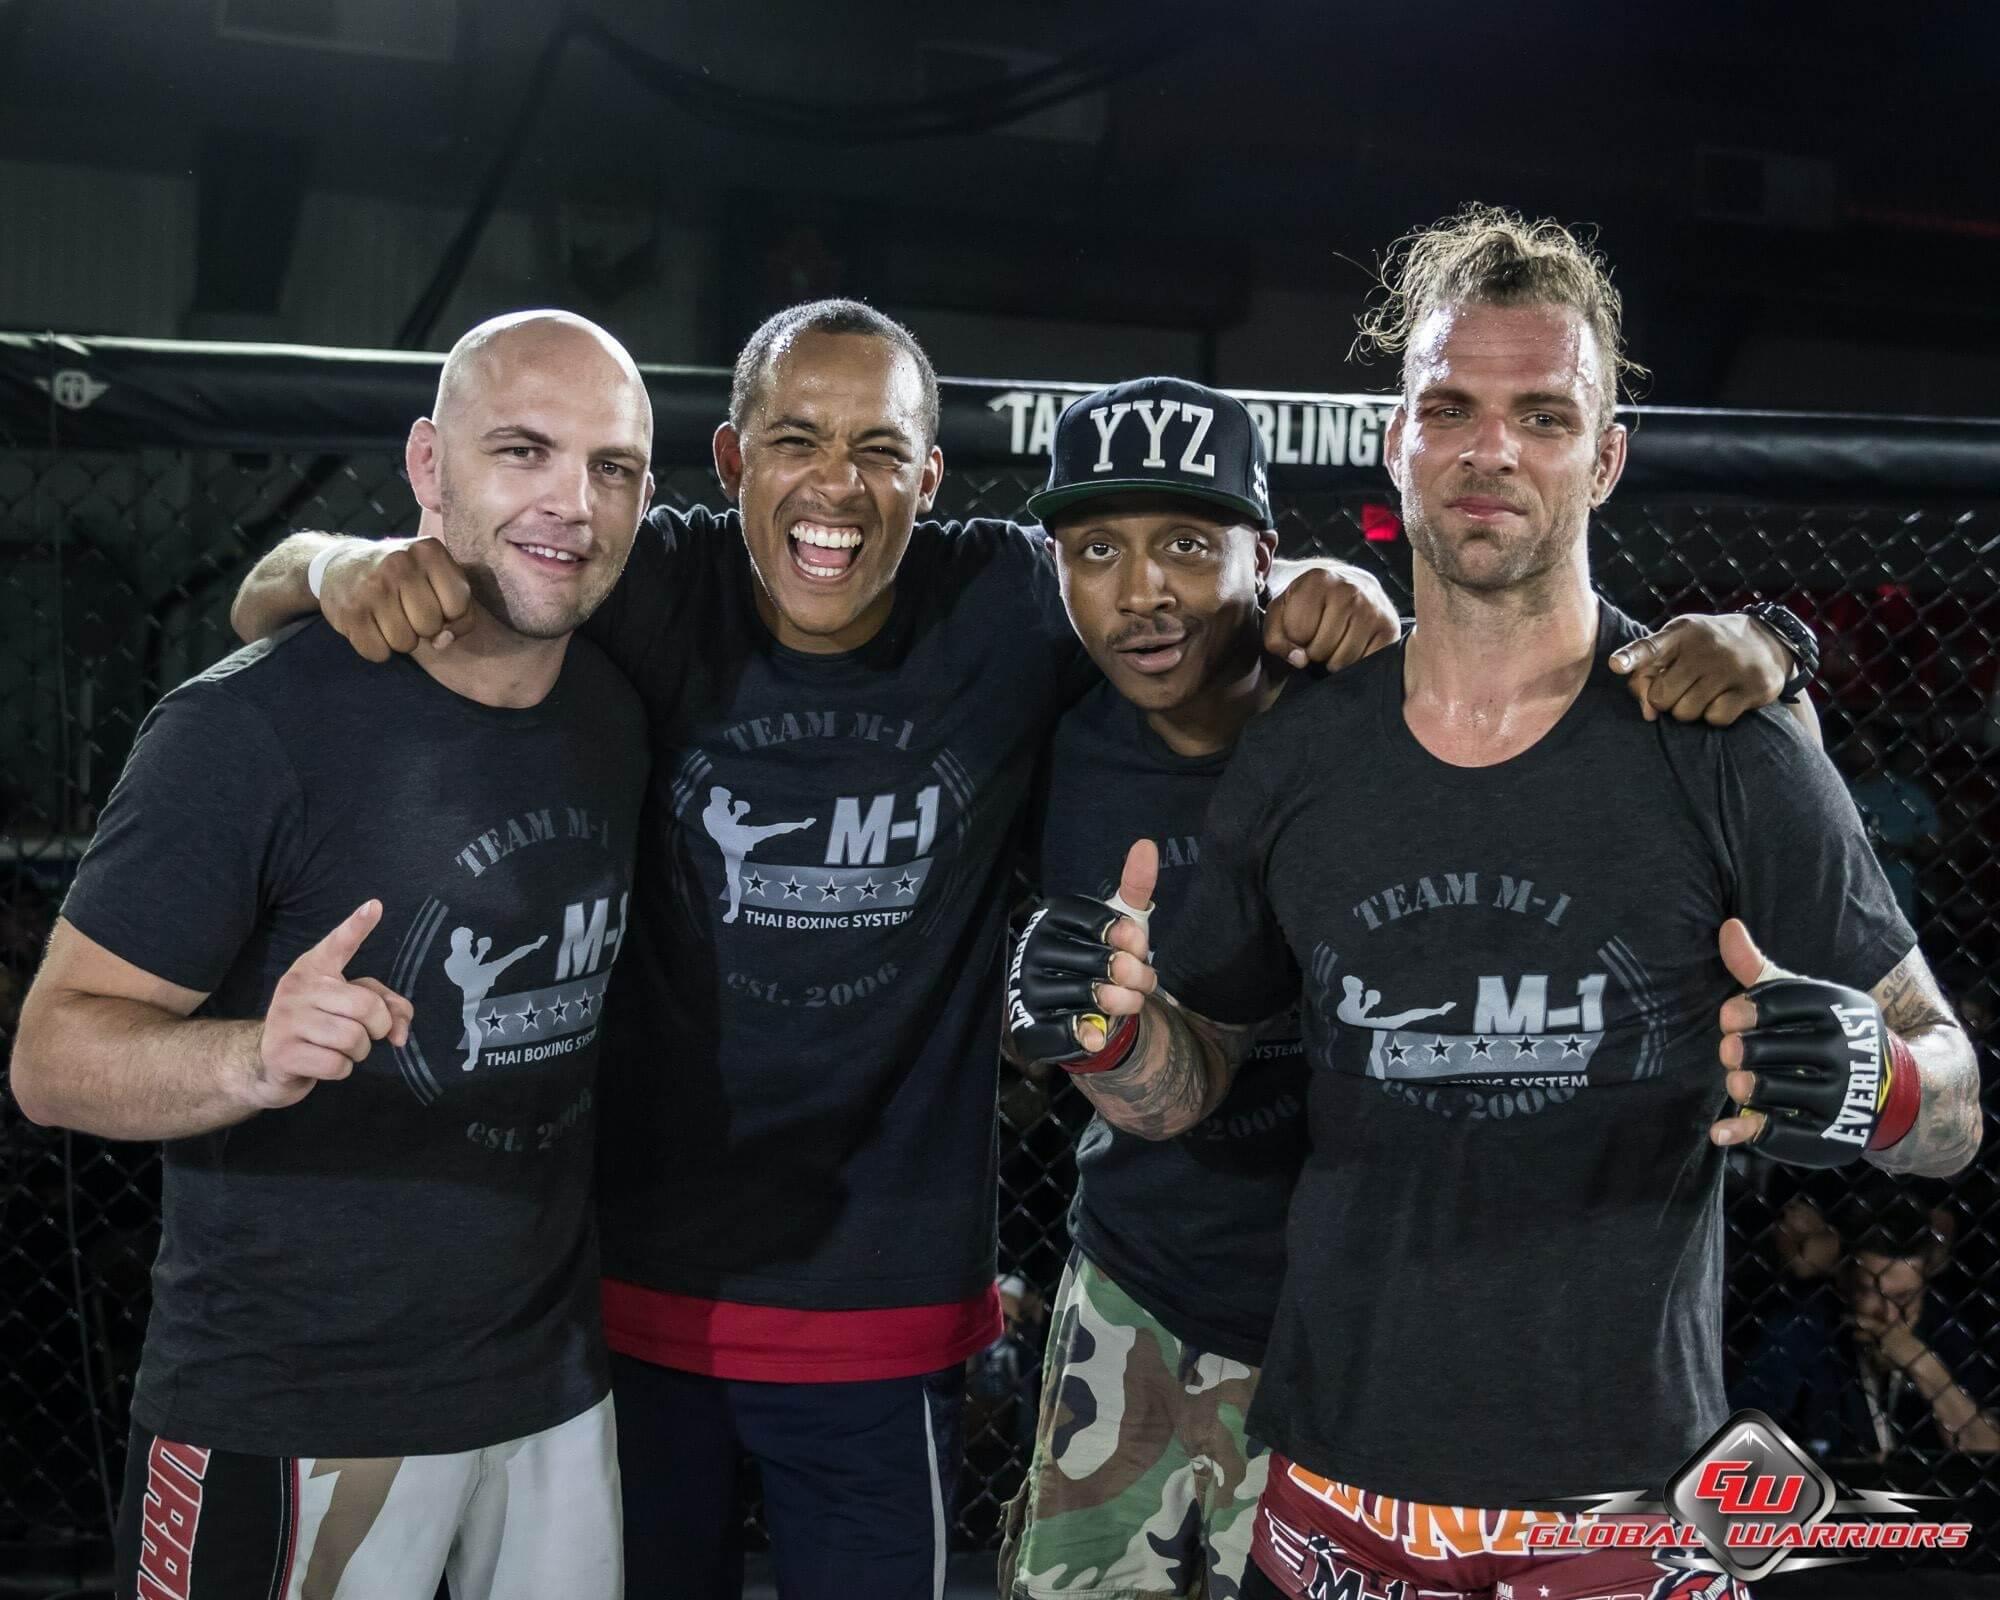 team-m1-muay-thai-boxing-athletes-9